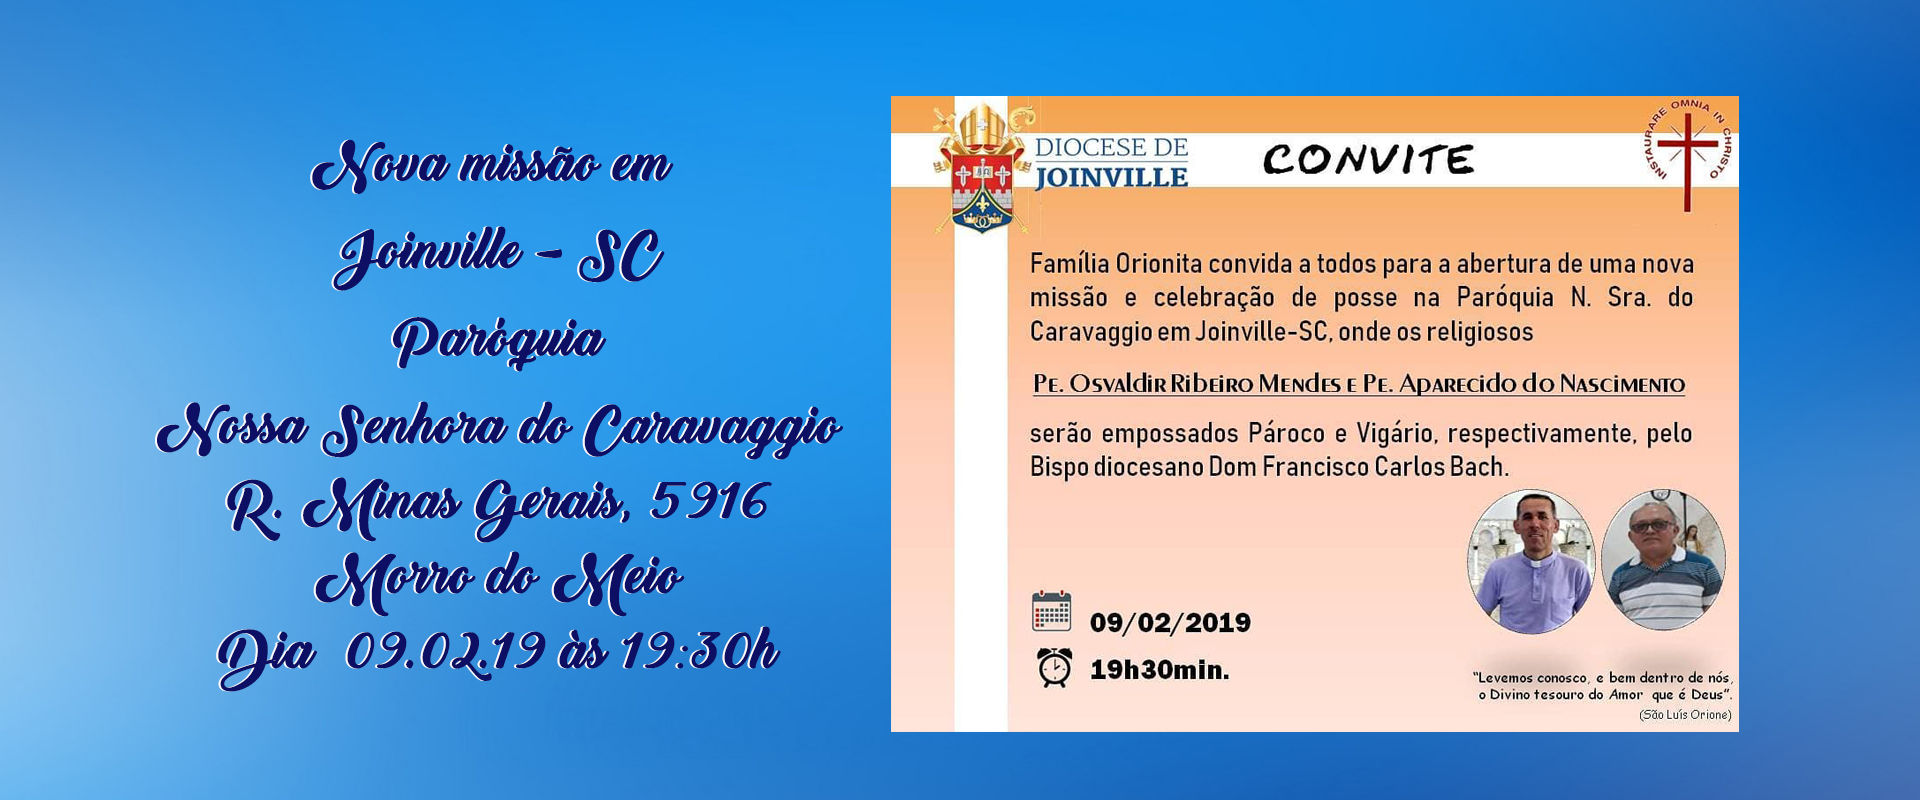 Convite – Nova missão em Joinville – SC